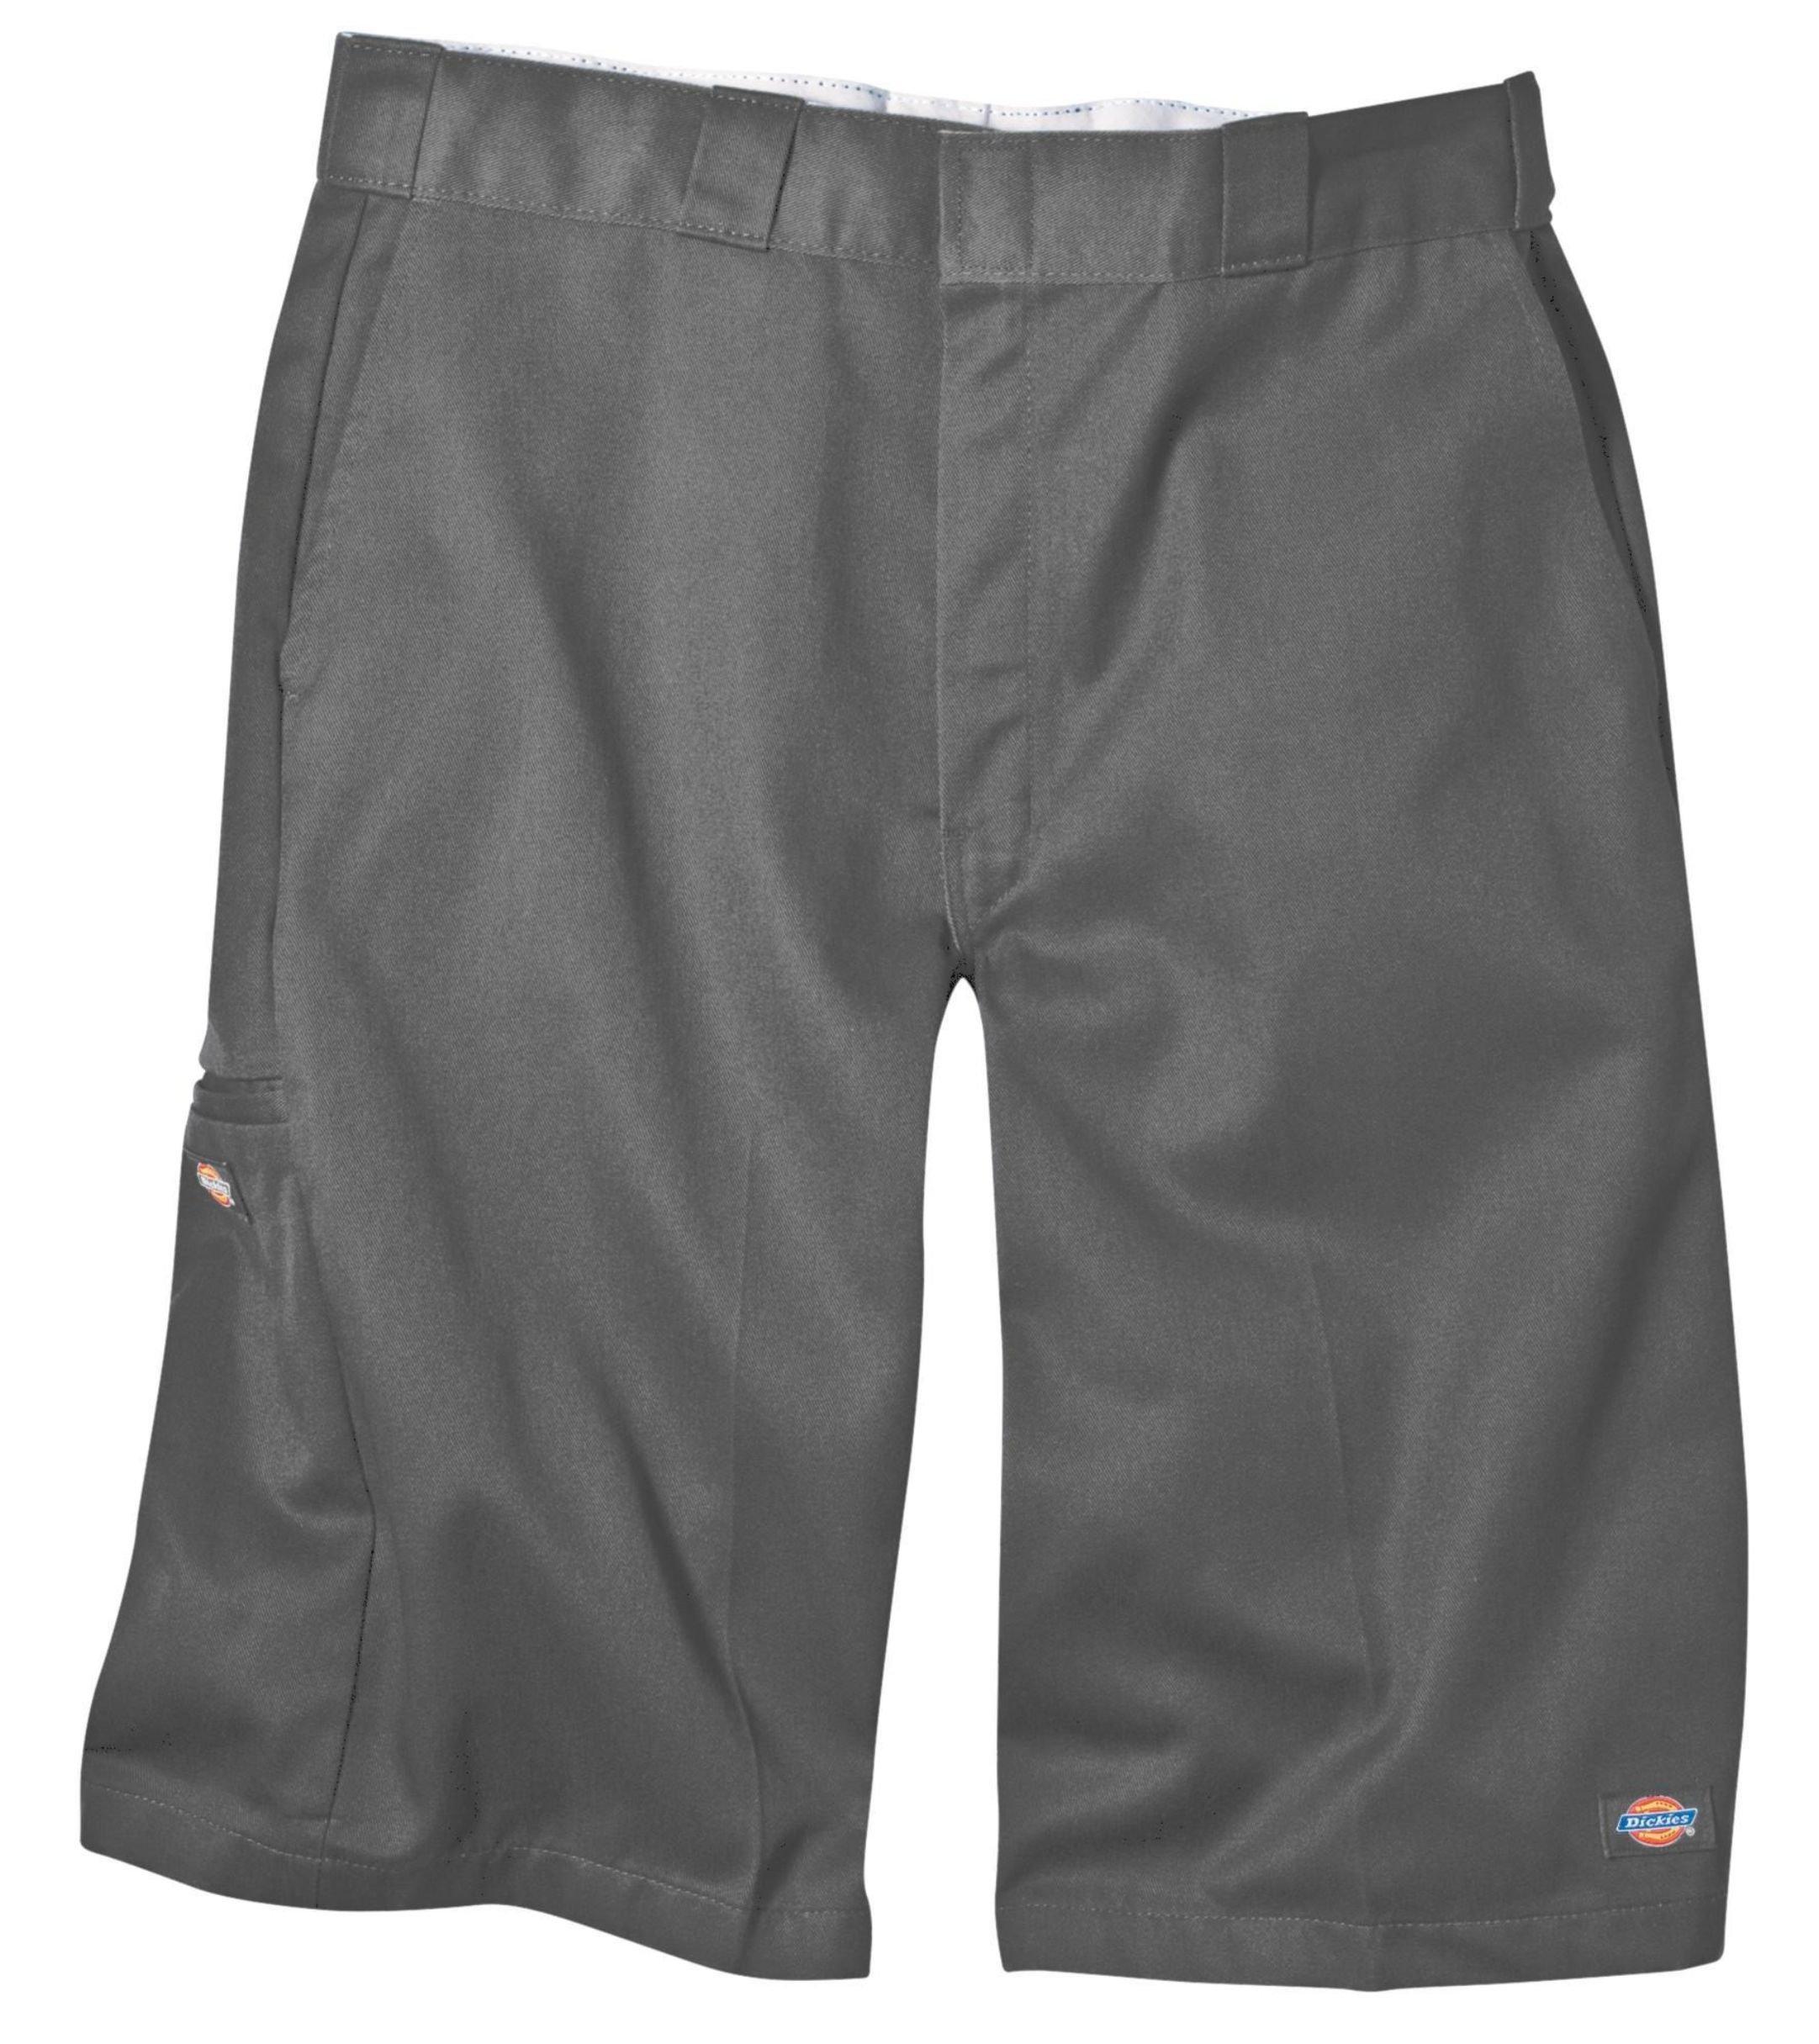 Dickies Men's Big-Tall 13 Inch Loose Fit Multi-Pocket Work Short, Charcoal, 50